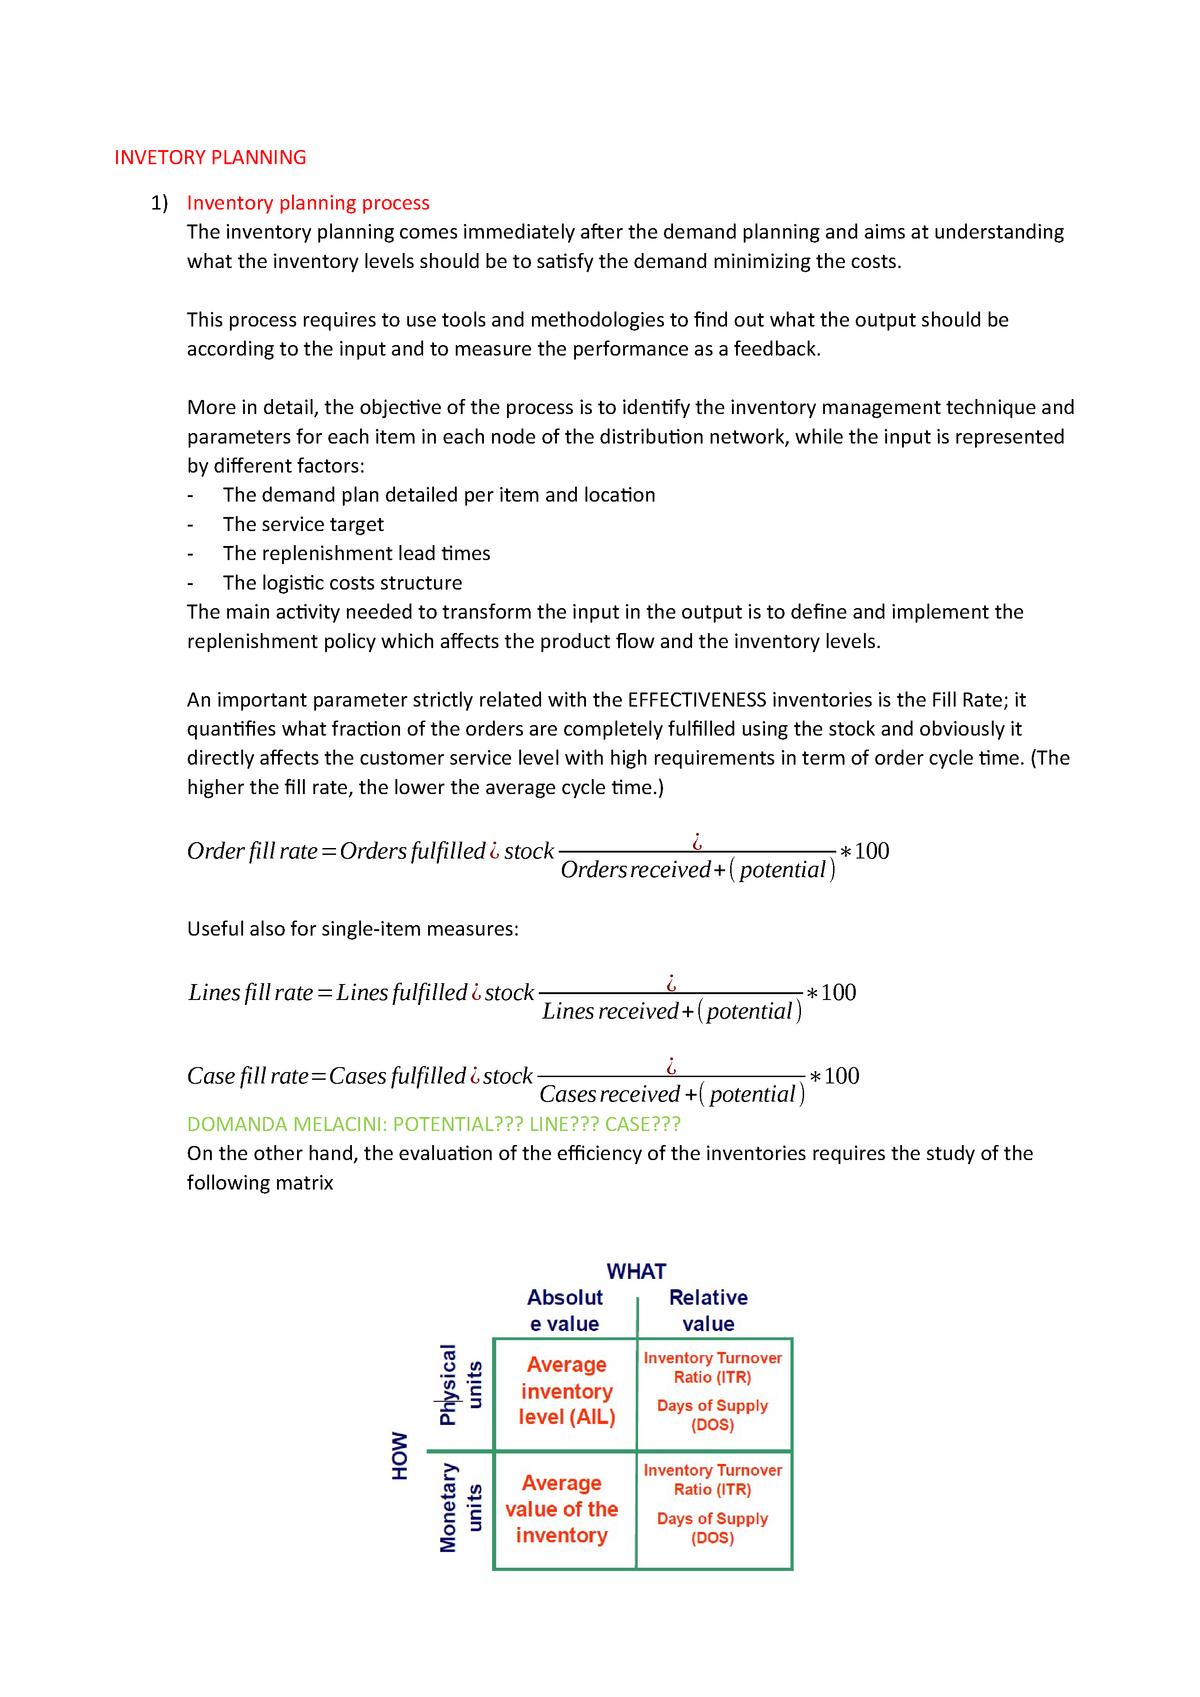 Inventory planning - Logistics management 96089 - StuDocu